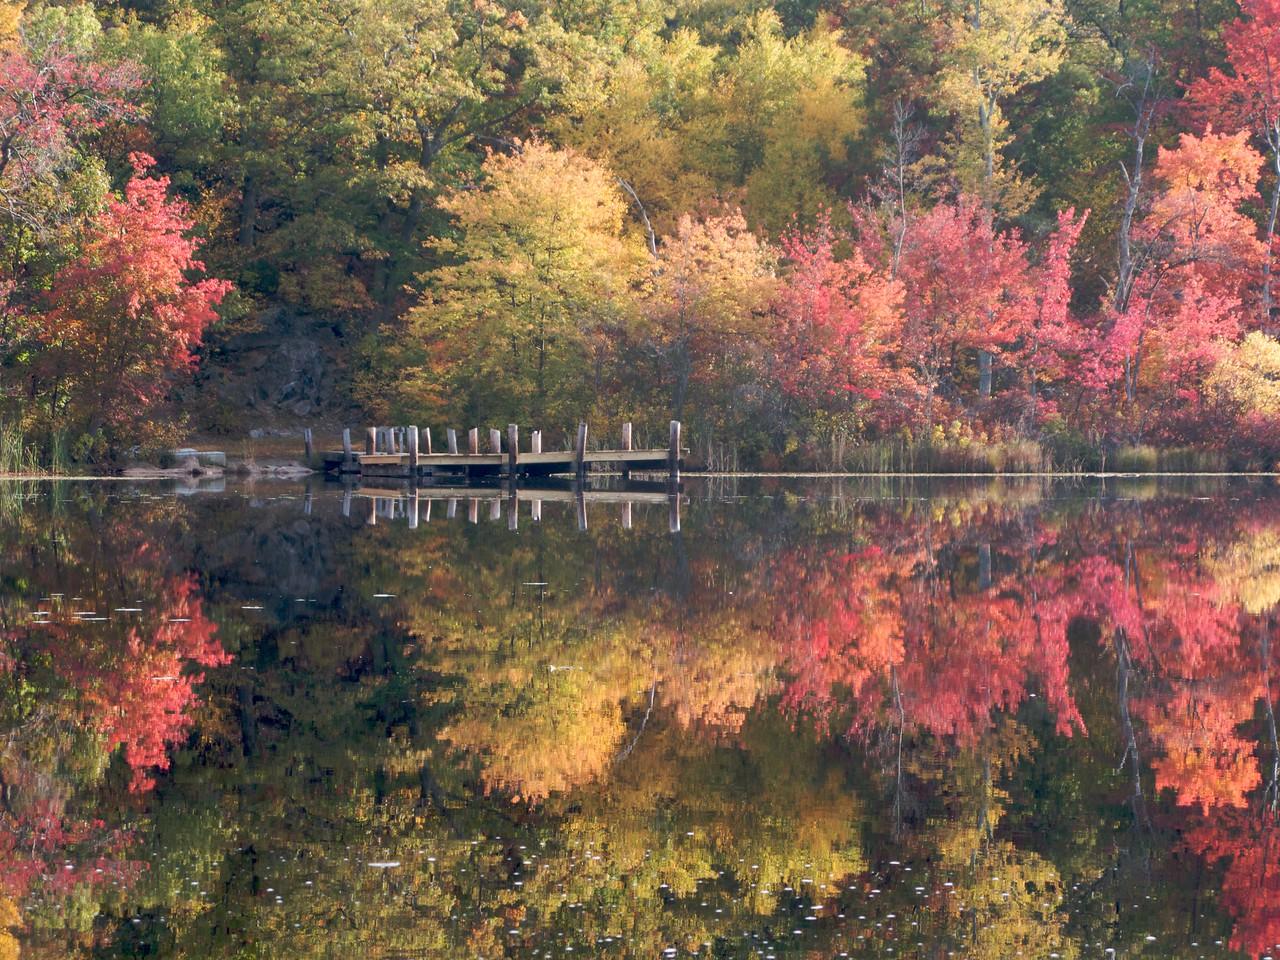 Stony Brook Reservation, Massachusetts